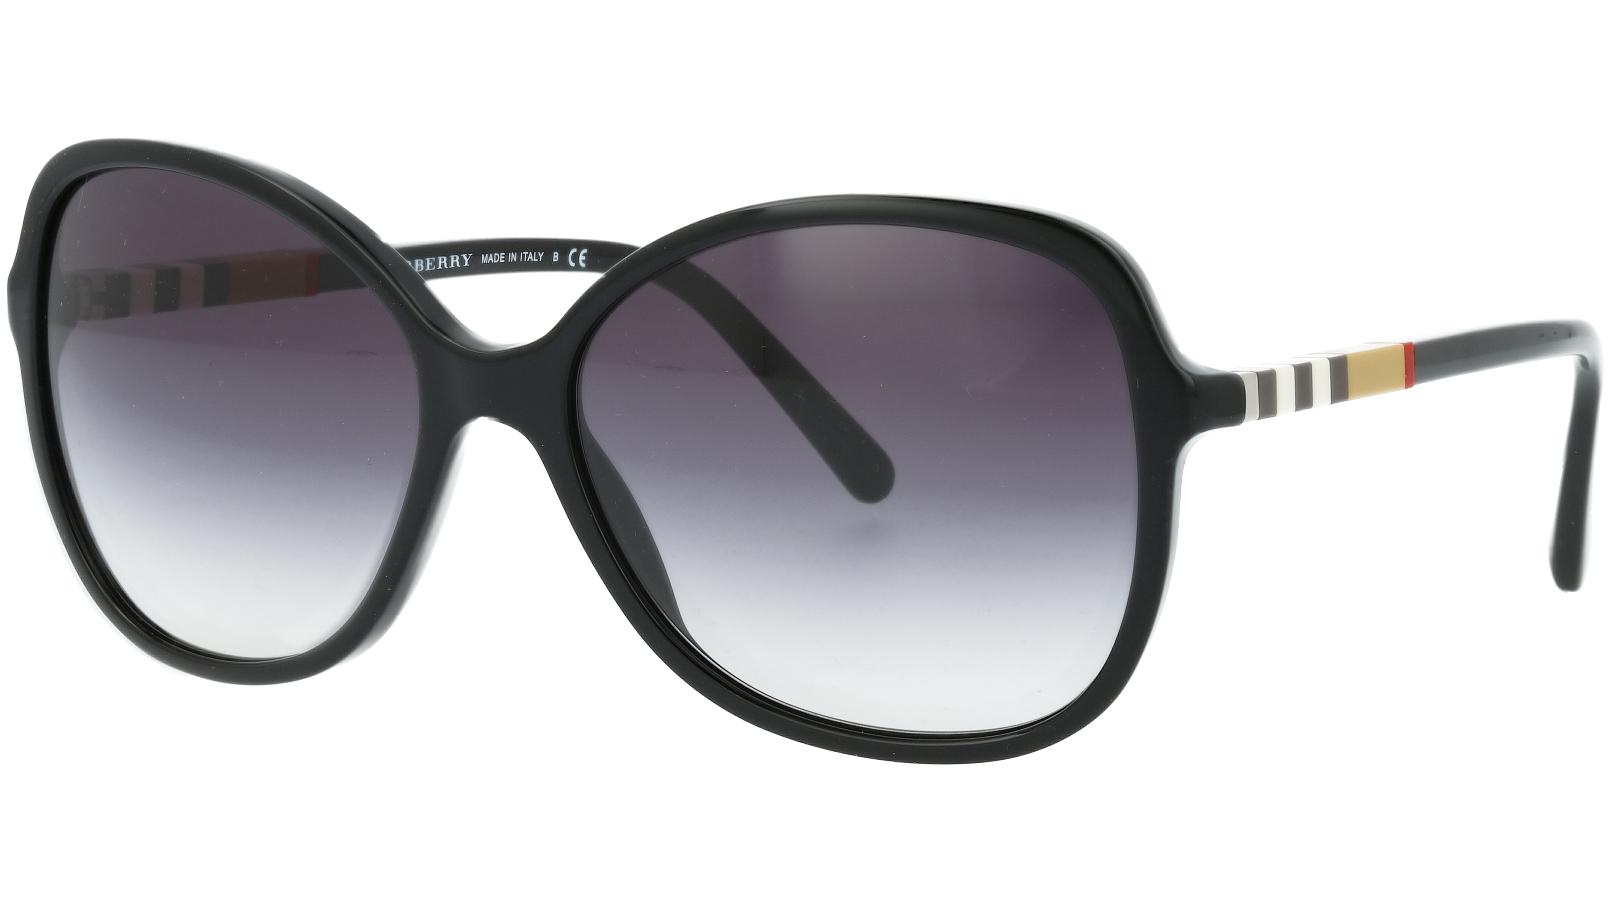 BURBERRY BE4197 3001/8G 58 BLACK Sunglasses